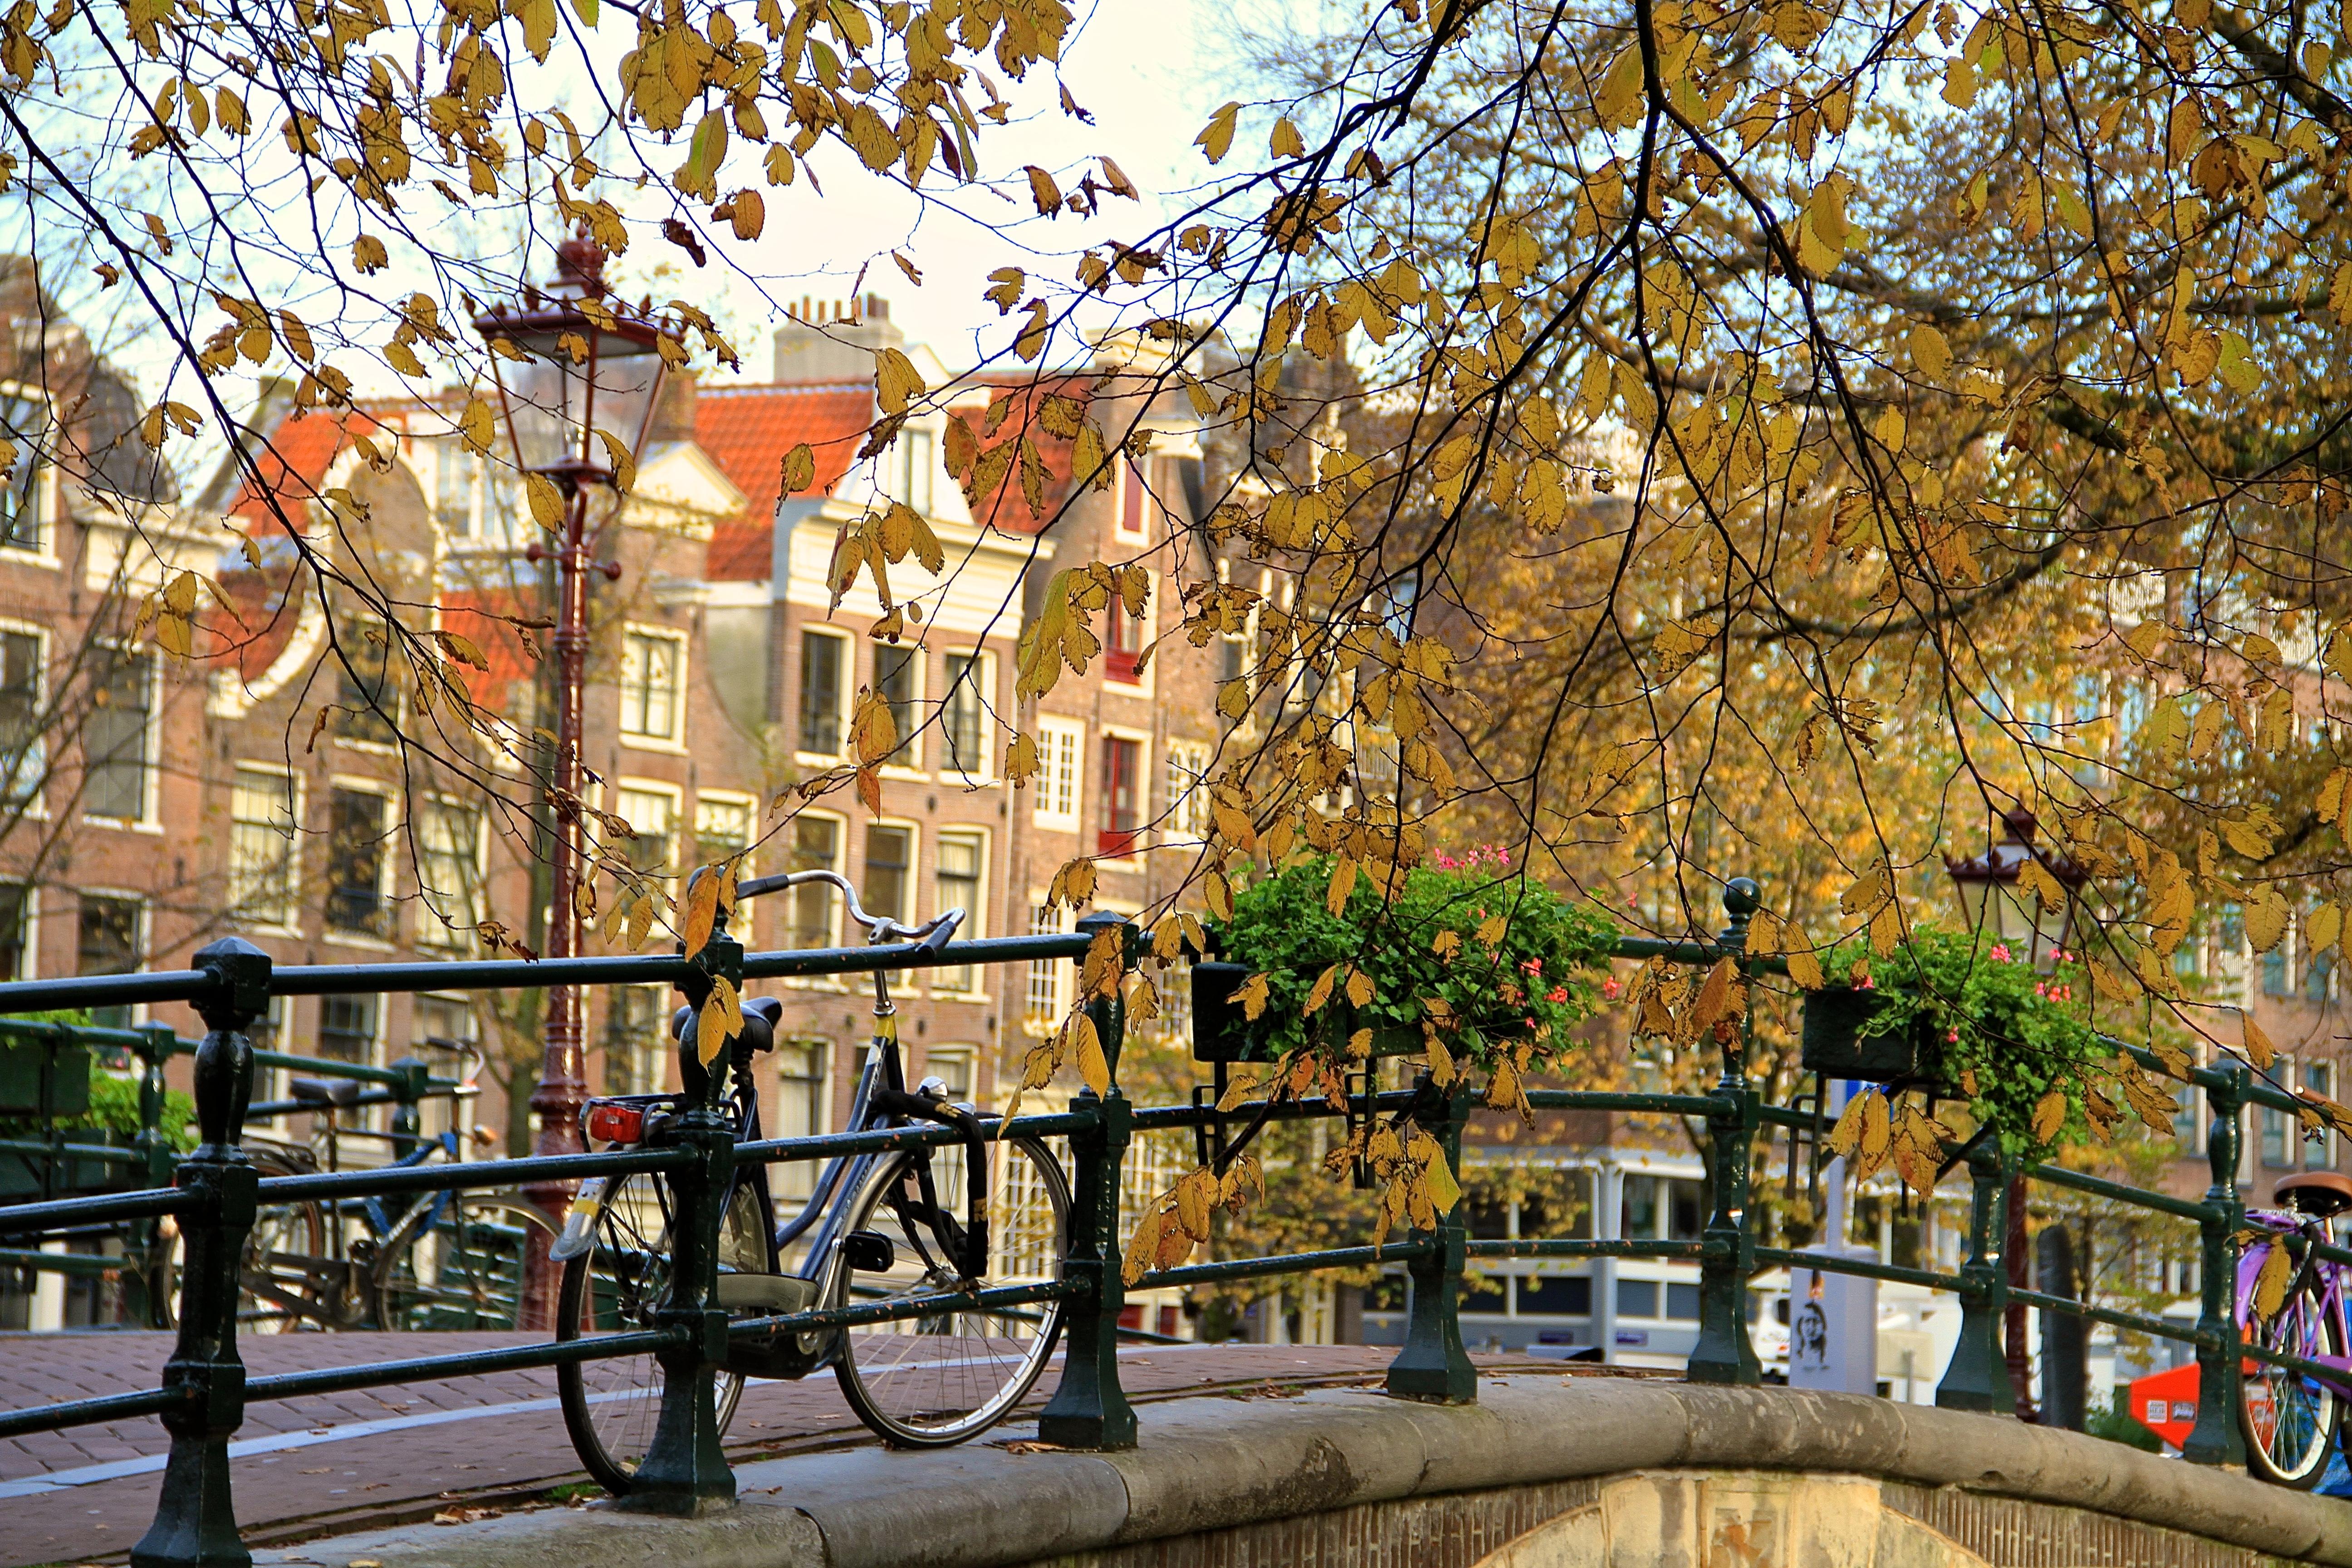 Autumn Leaves 3d Live Wallpaper Autumn Scene Of Amsterdam Bike On Bridge Falling Off